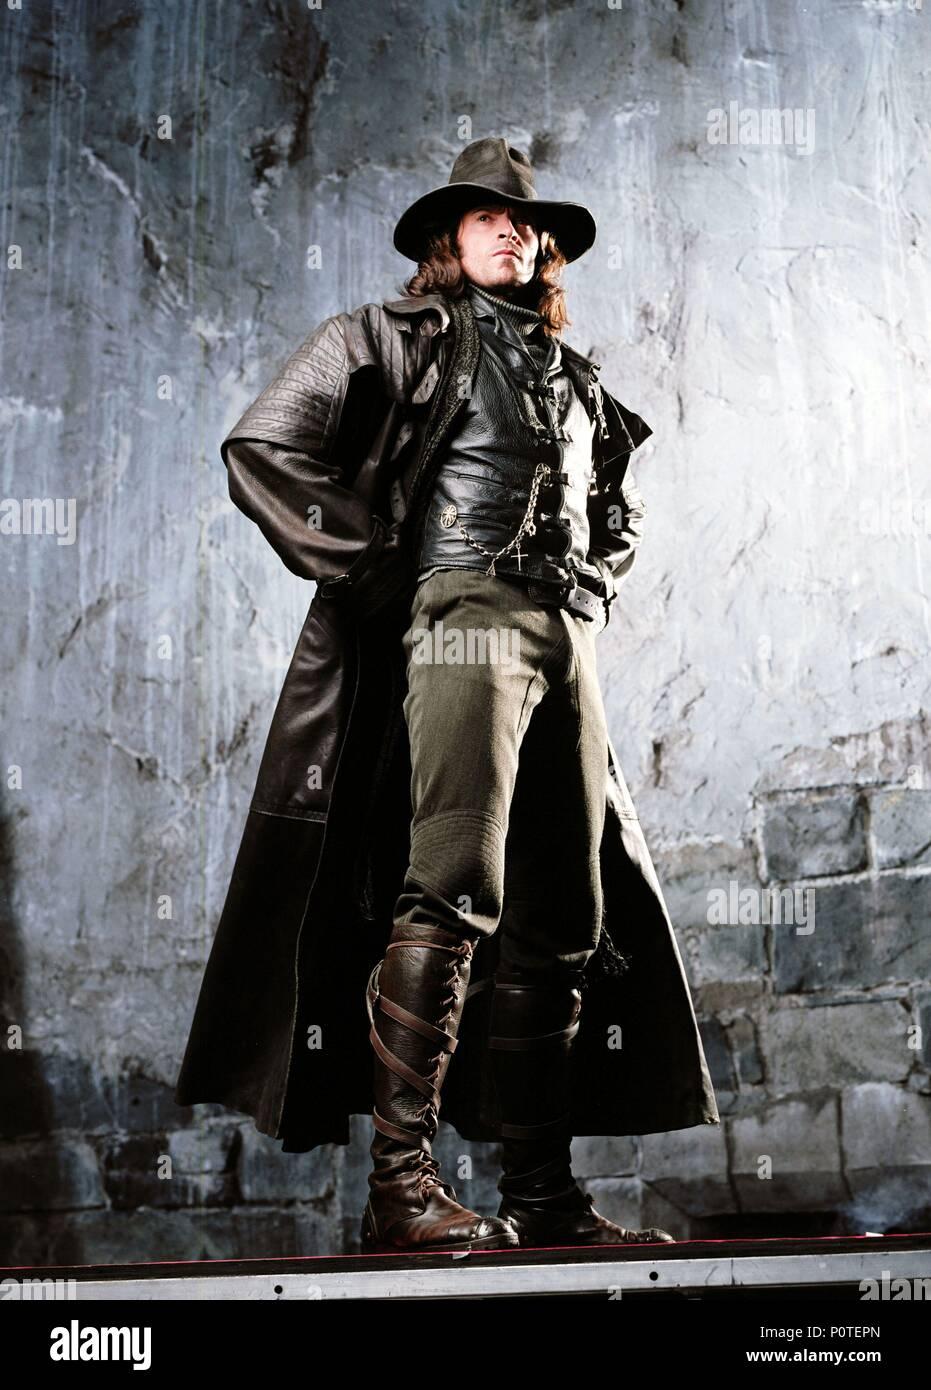 Original Film Title: VAN HELSING.  English Title: VAN HELSING.  Film Director: STEPHEN SOMMERS.  Year: 2004.  Stars: HUGH JACKMAN. Credit: UNIVERSAL / Album - Stock Image